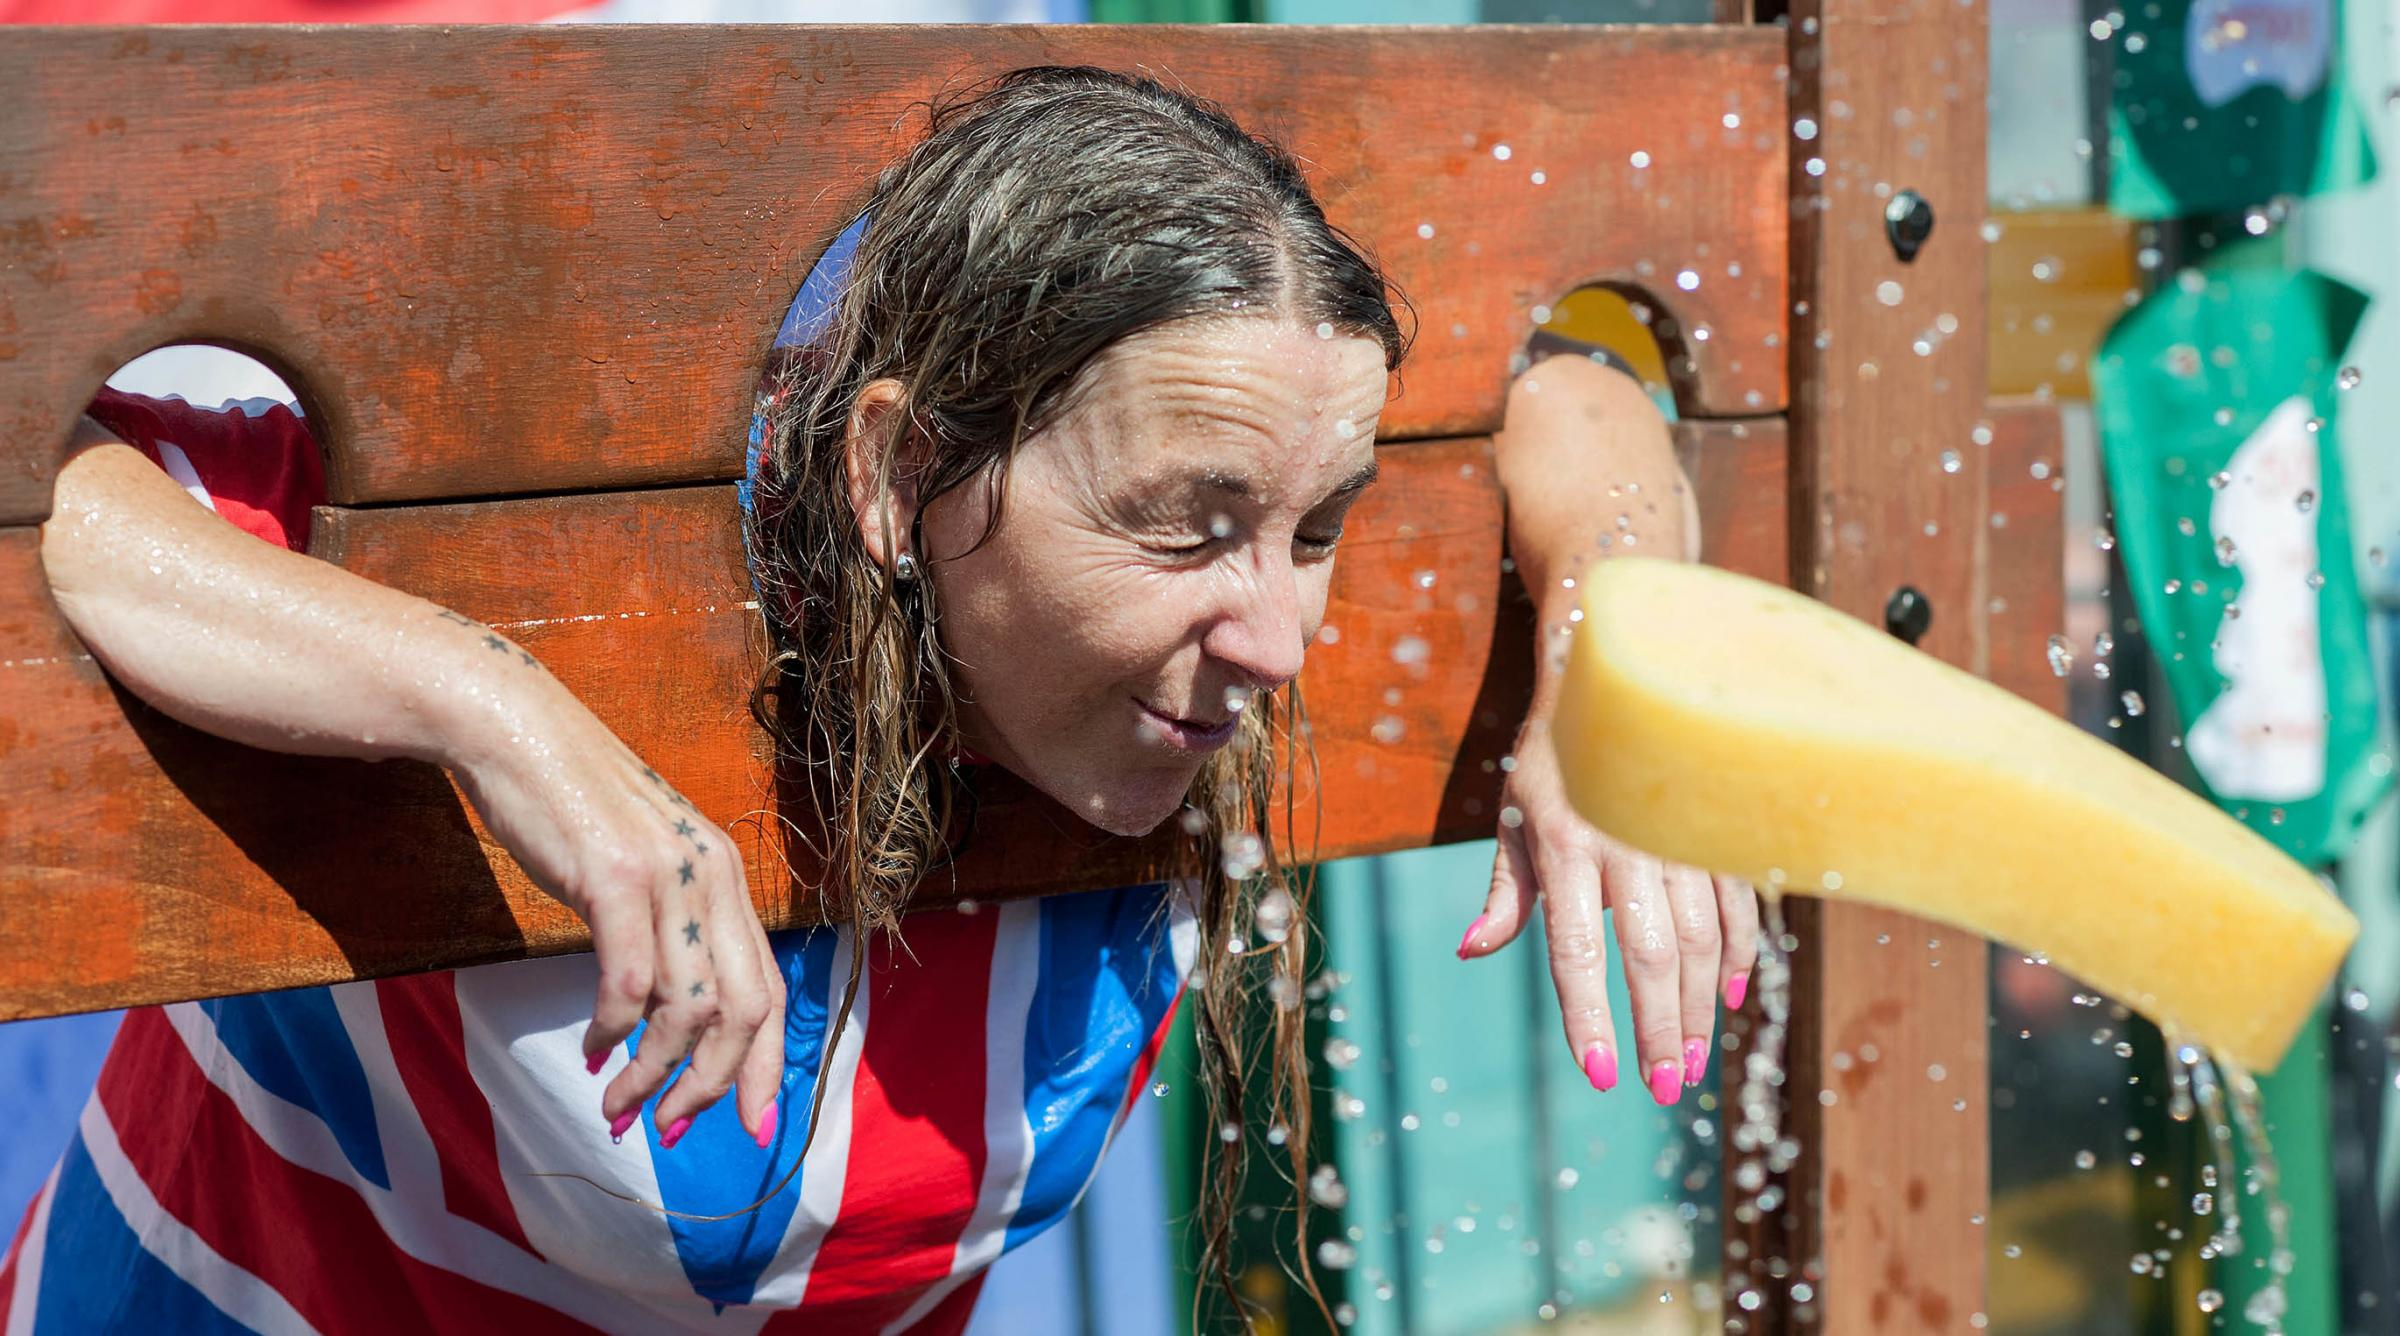 13 photos from Penryn Fair Day